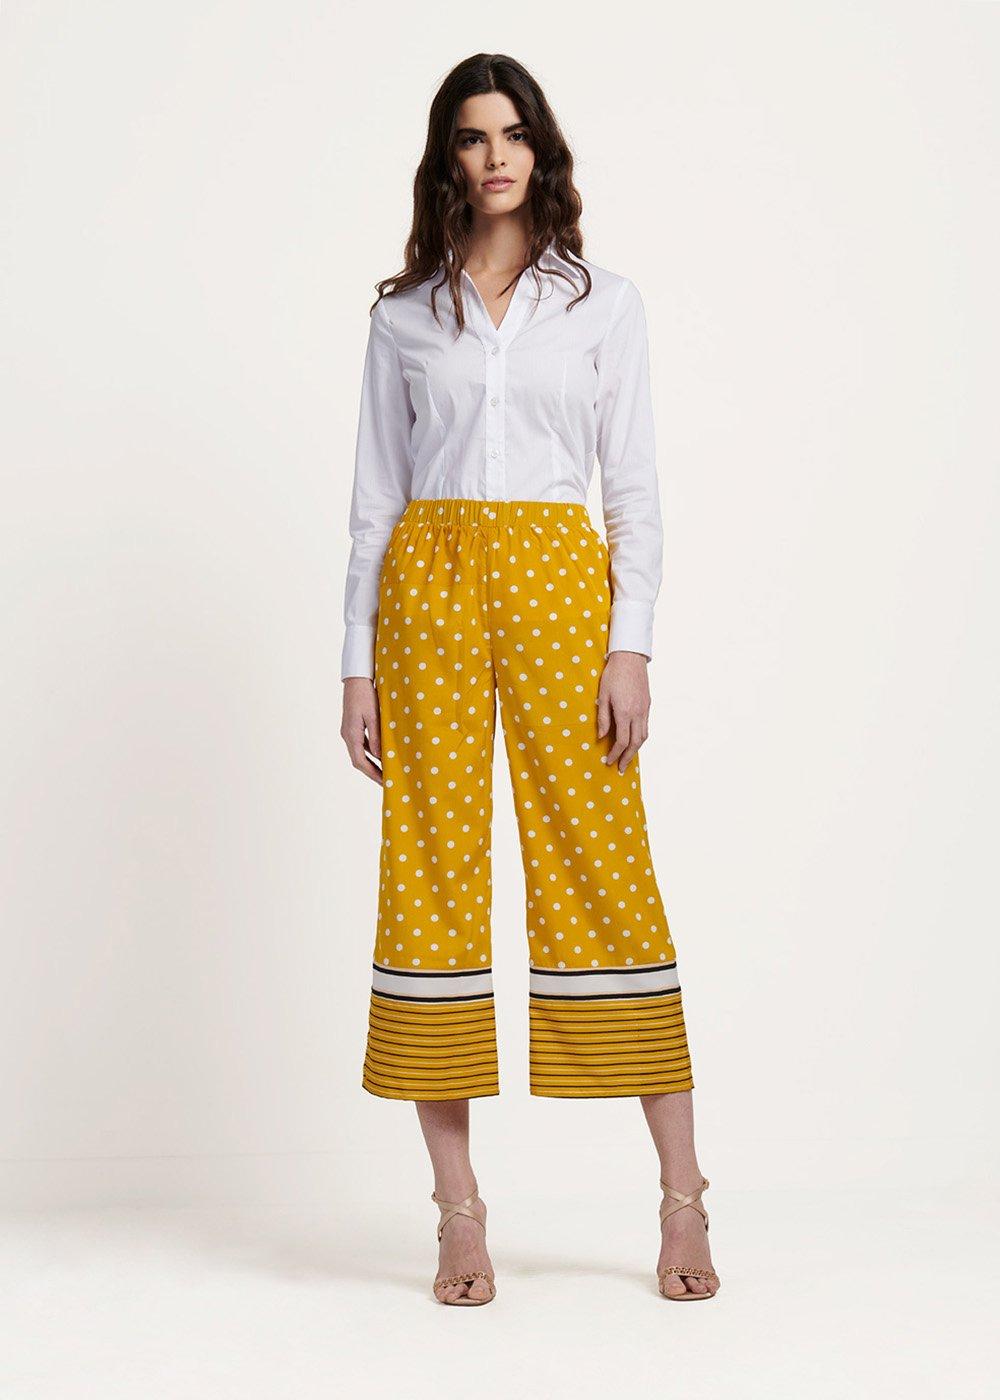 Pantalone Paride stampa pois - Sole\ White\ Pois - Donna